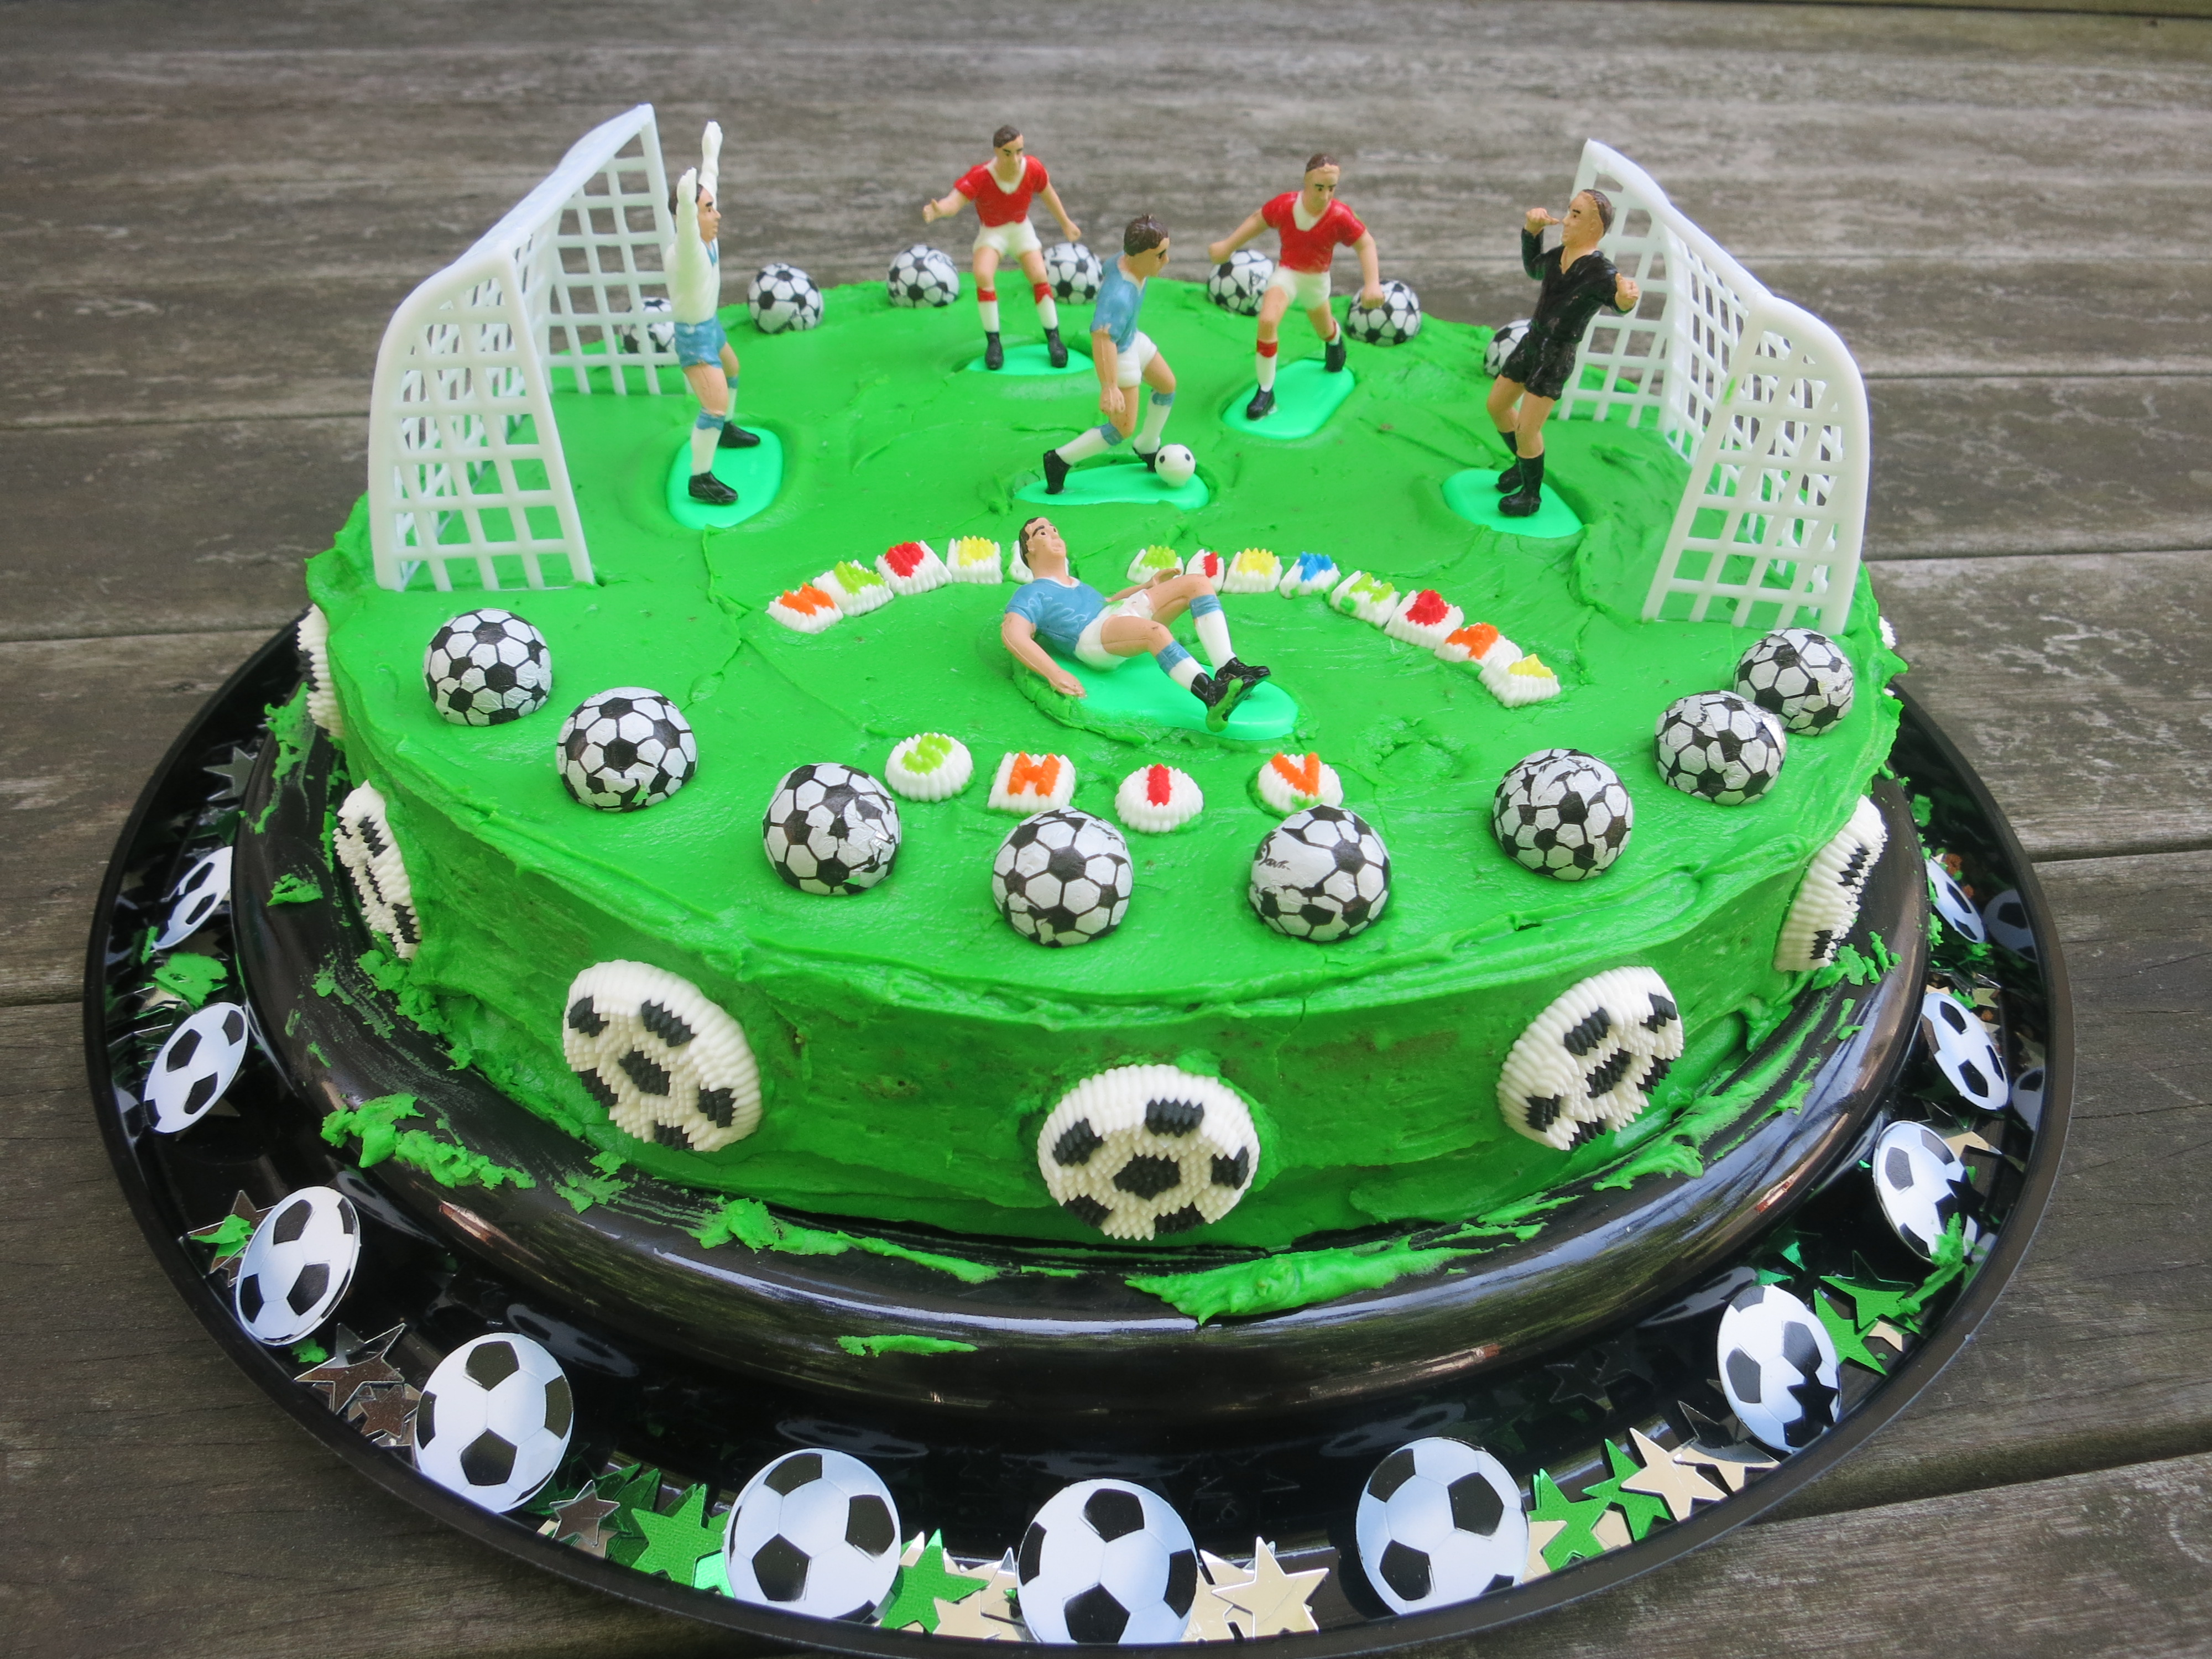 Soccer Birthday Cake Ideas